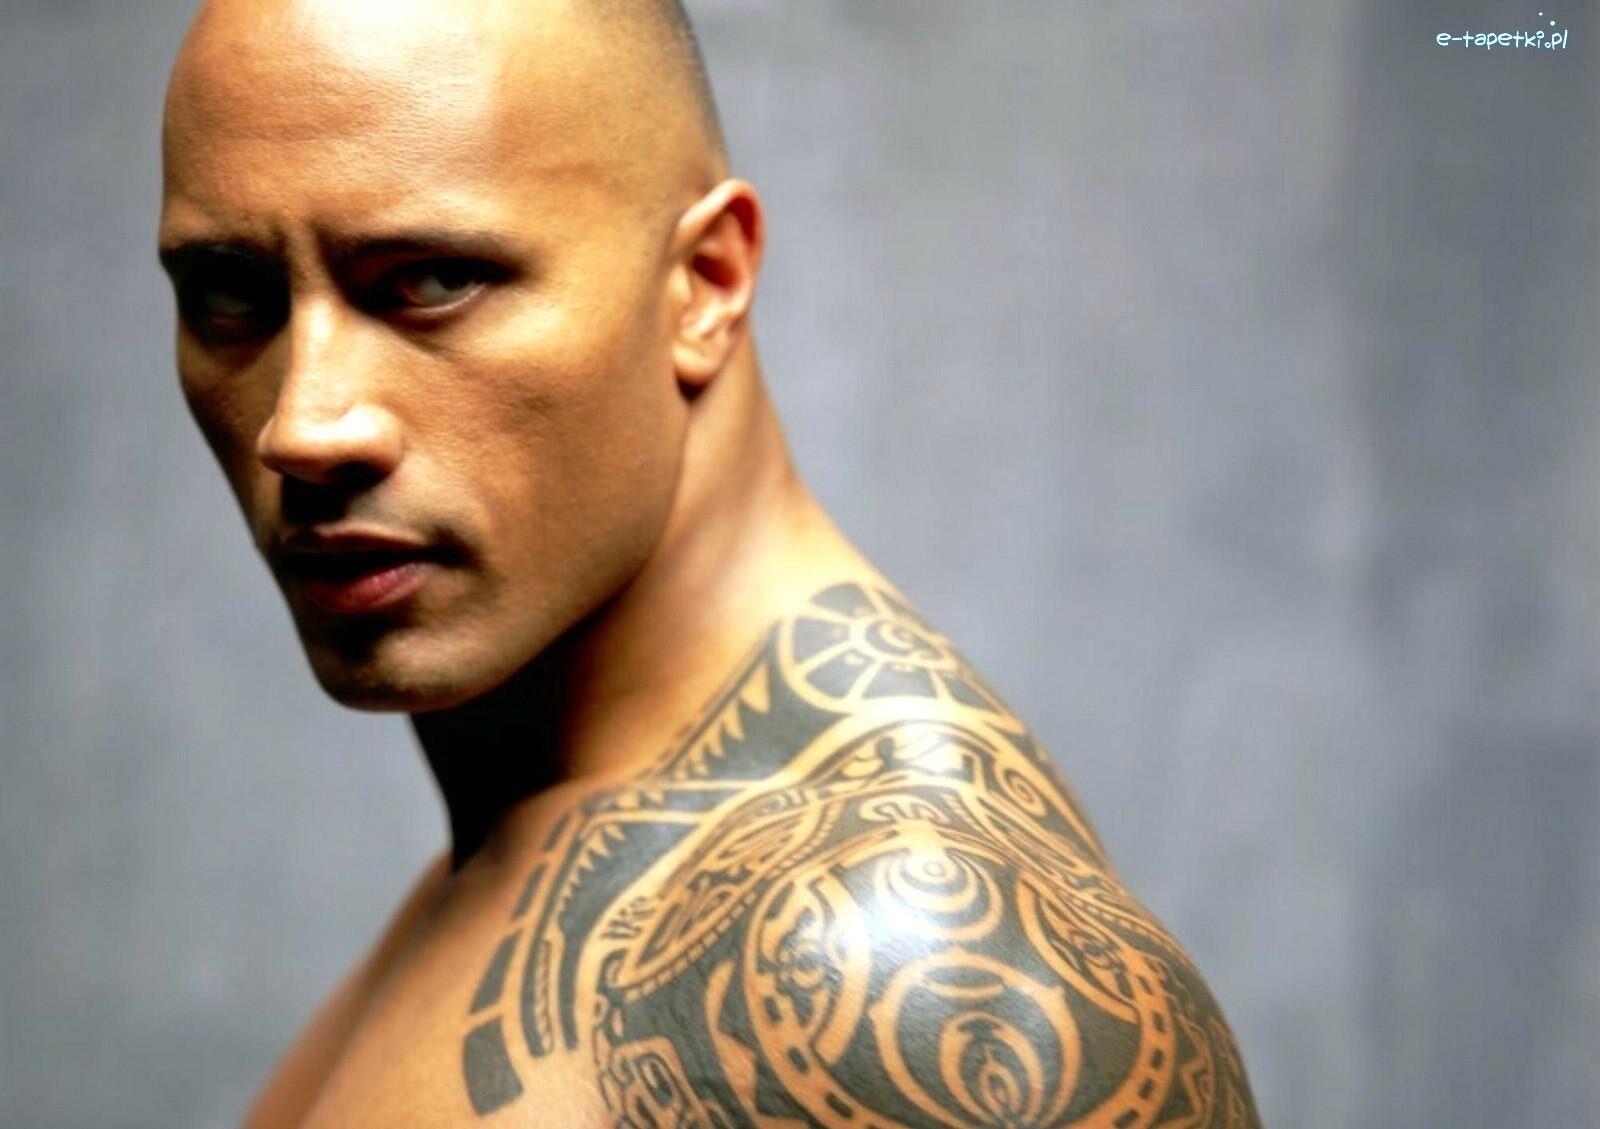 Dwayne Johnson Tatuaż